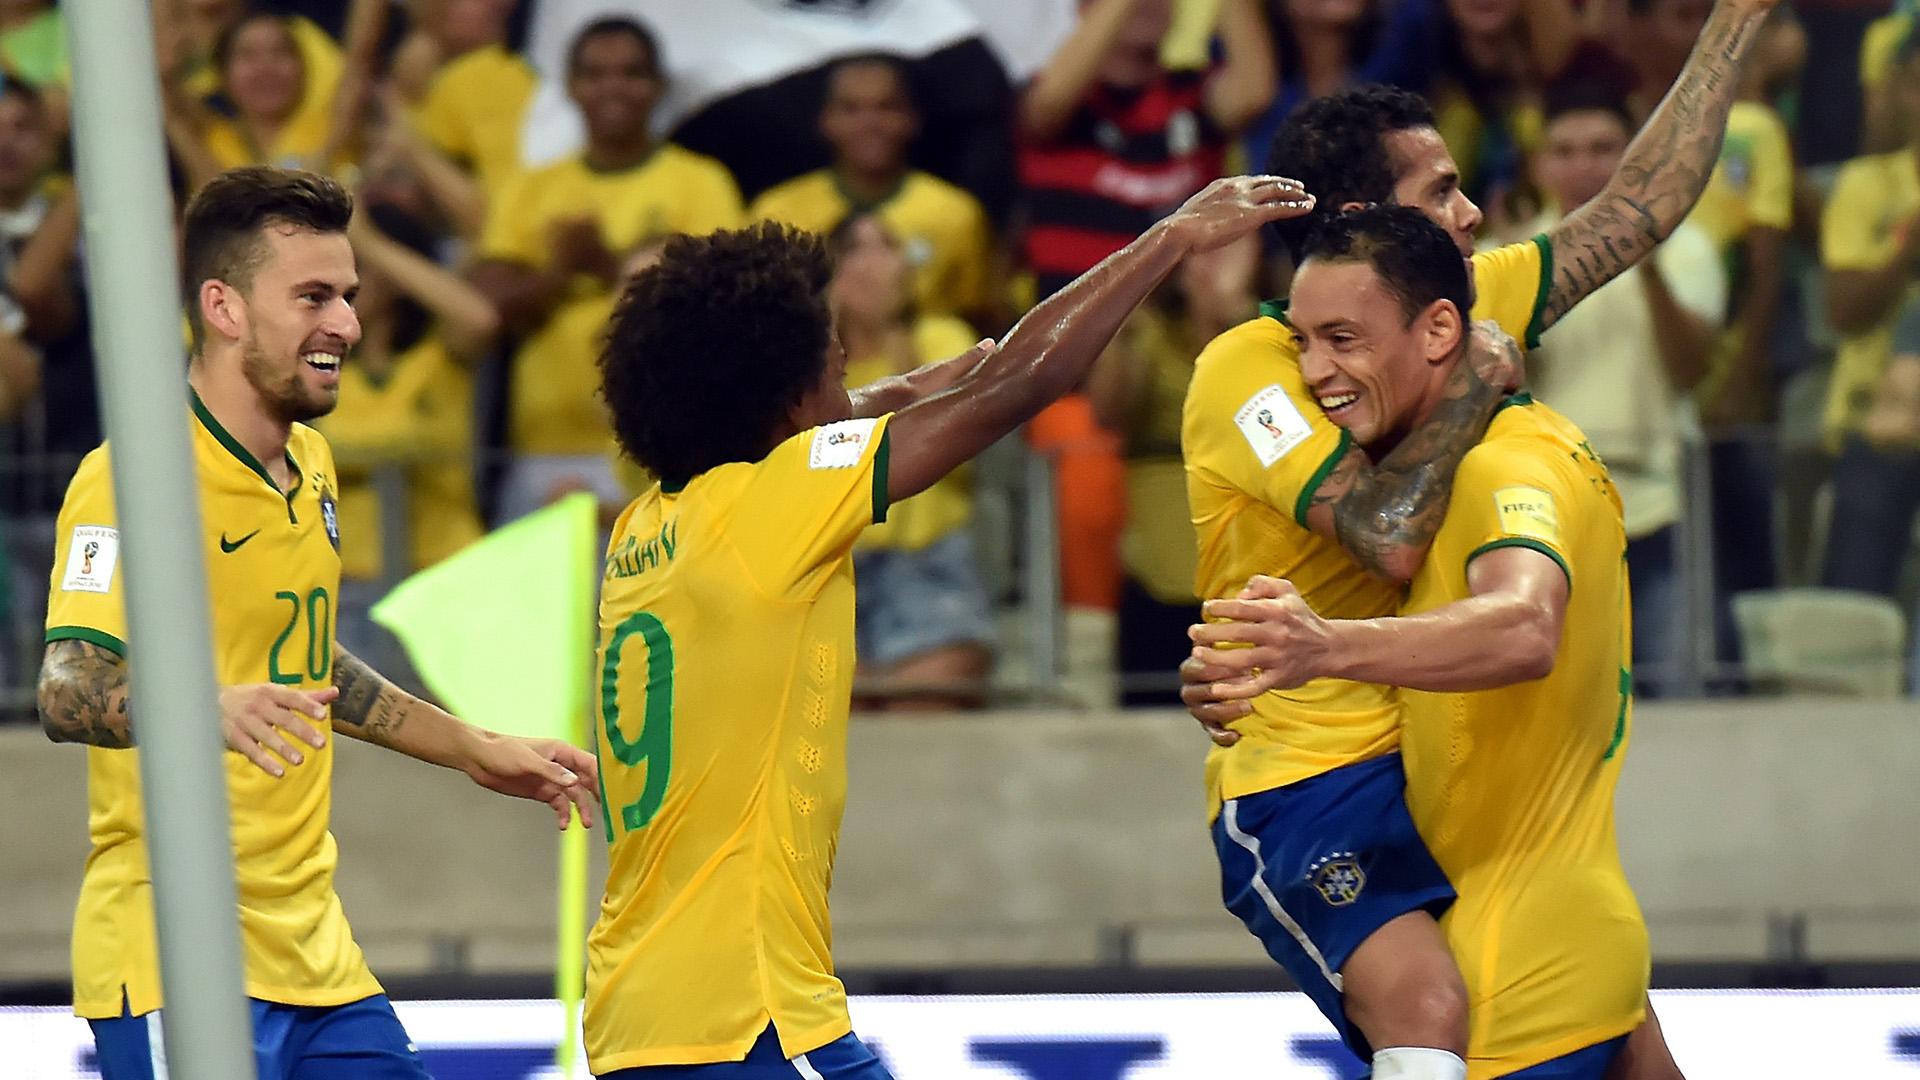 Best Brazil World Cup 2018 - ricardo-oliveira-willian-lucas-lima-brazil-venezuela-world-cup-qualifiers-13102015_1te43lfuyusmb1uu4ga58807dm  You Should Have_766535 .jpg?t\u003d1683763208